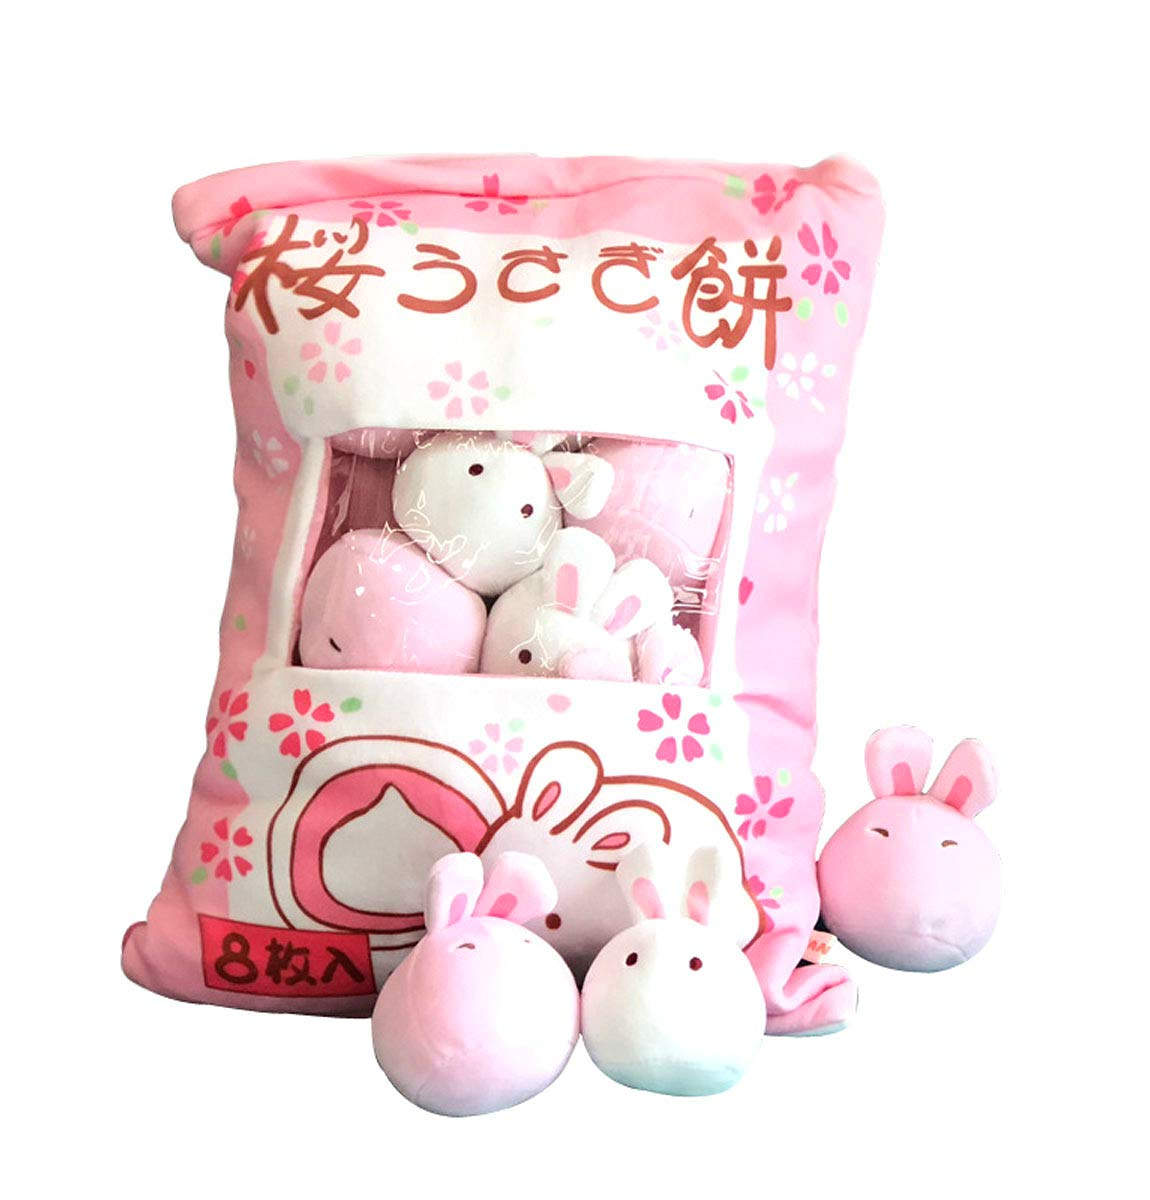 Nenalayo Cute Throw Pillow Stuffed Animal Toys Removable Fluffy Bunnies Creative Gifts for Teens Girls Kids by Nenalayo (Image #1)